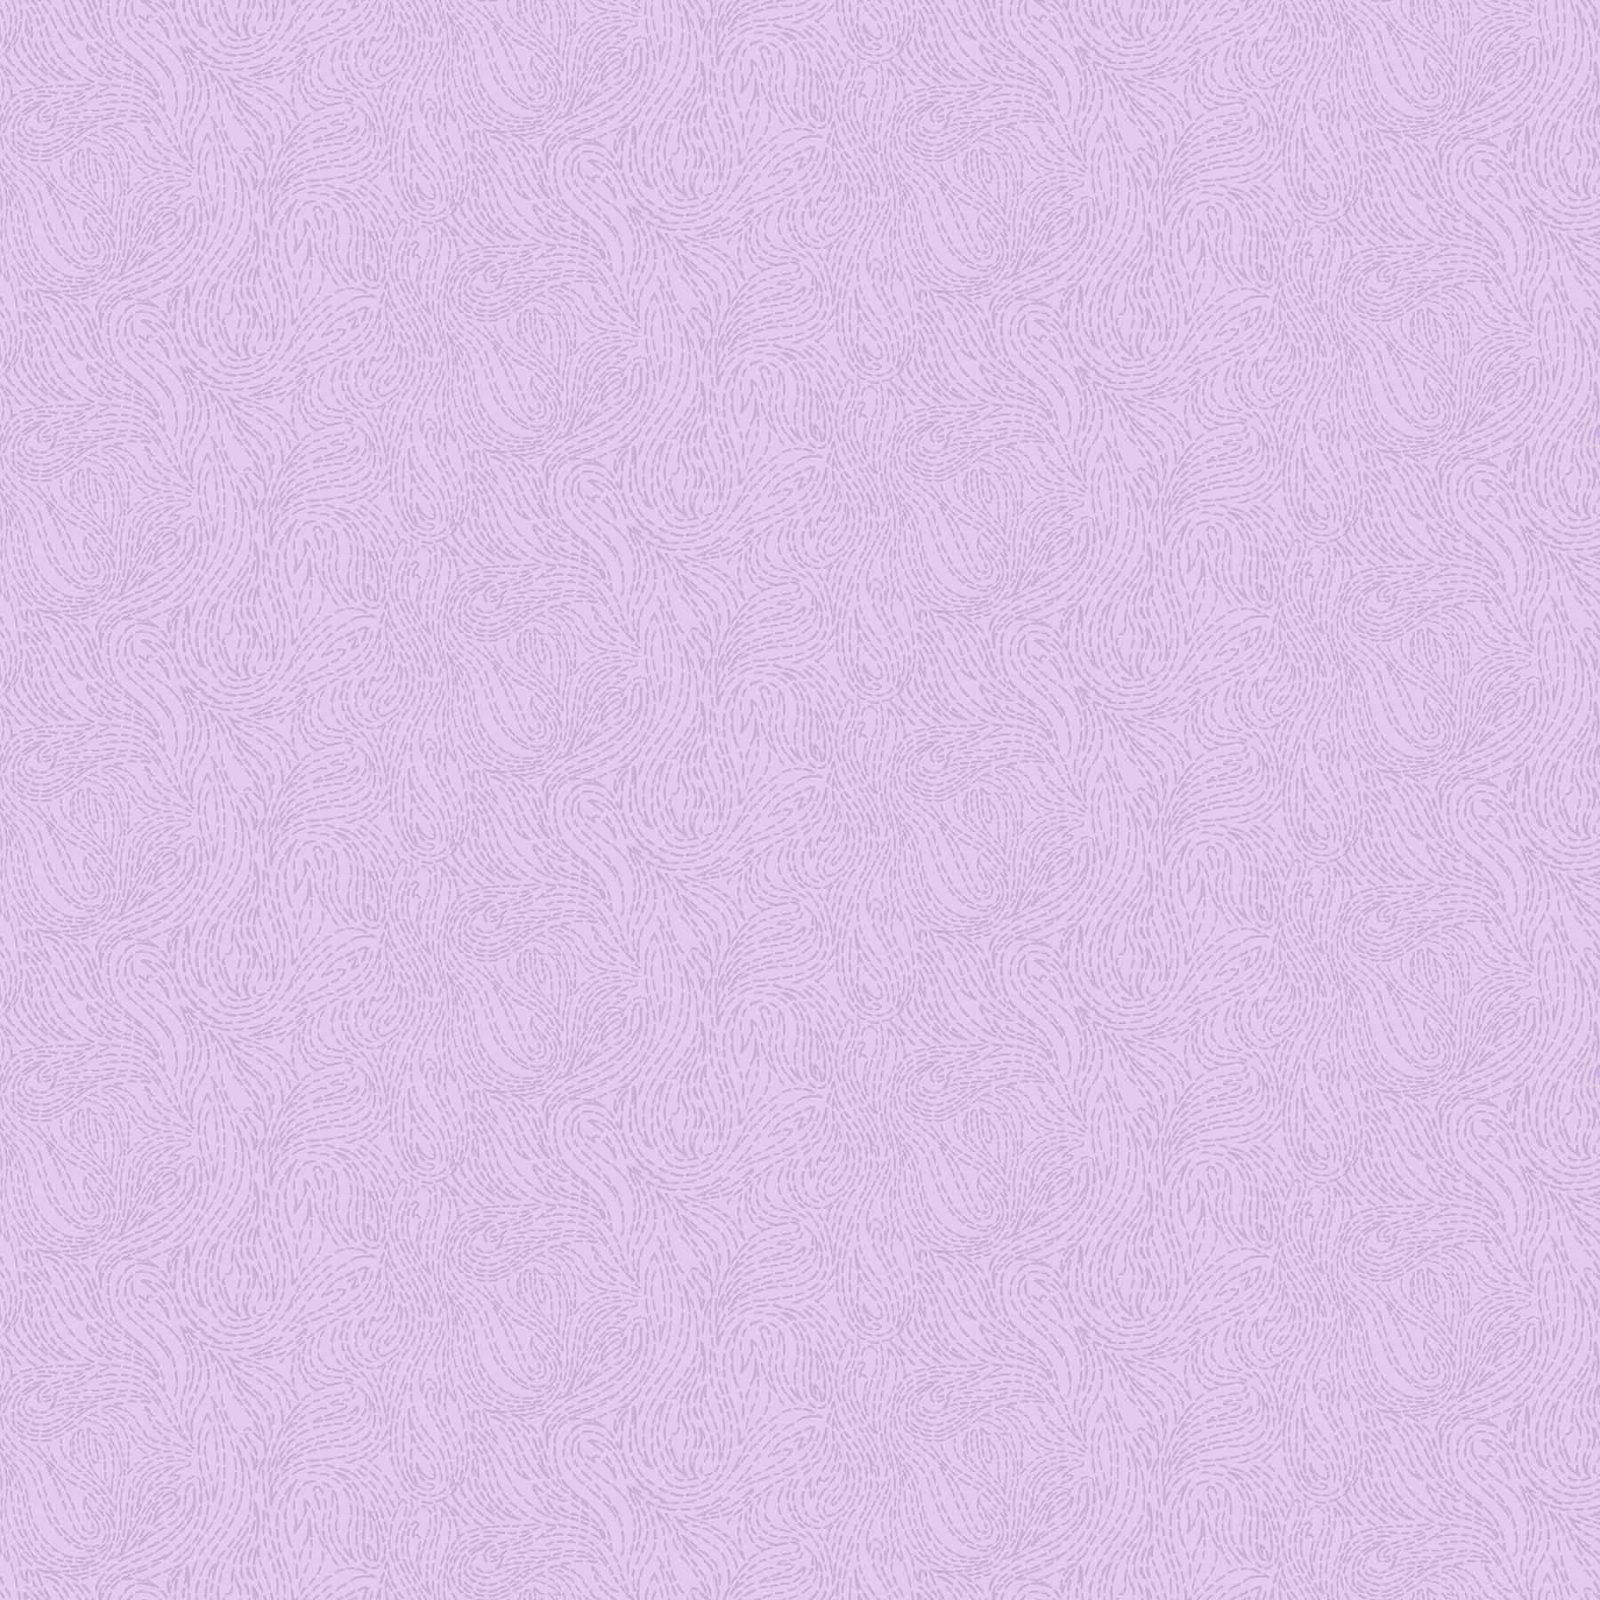 Elements by Ghazal Razavi - Fire - Lilac